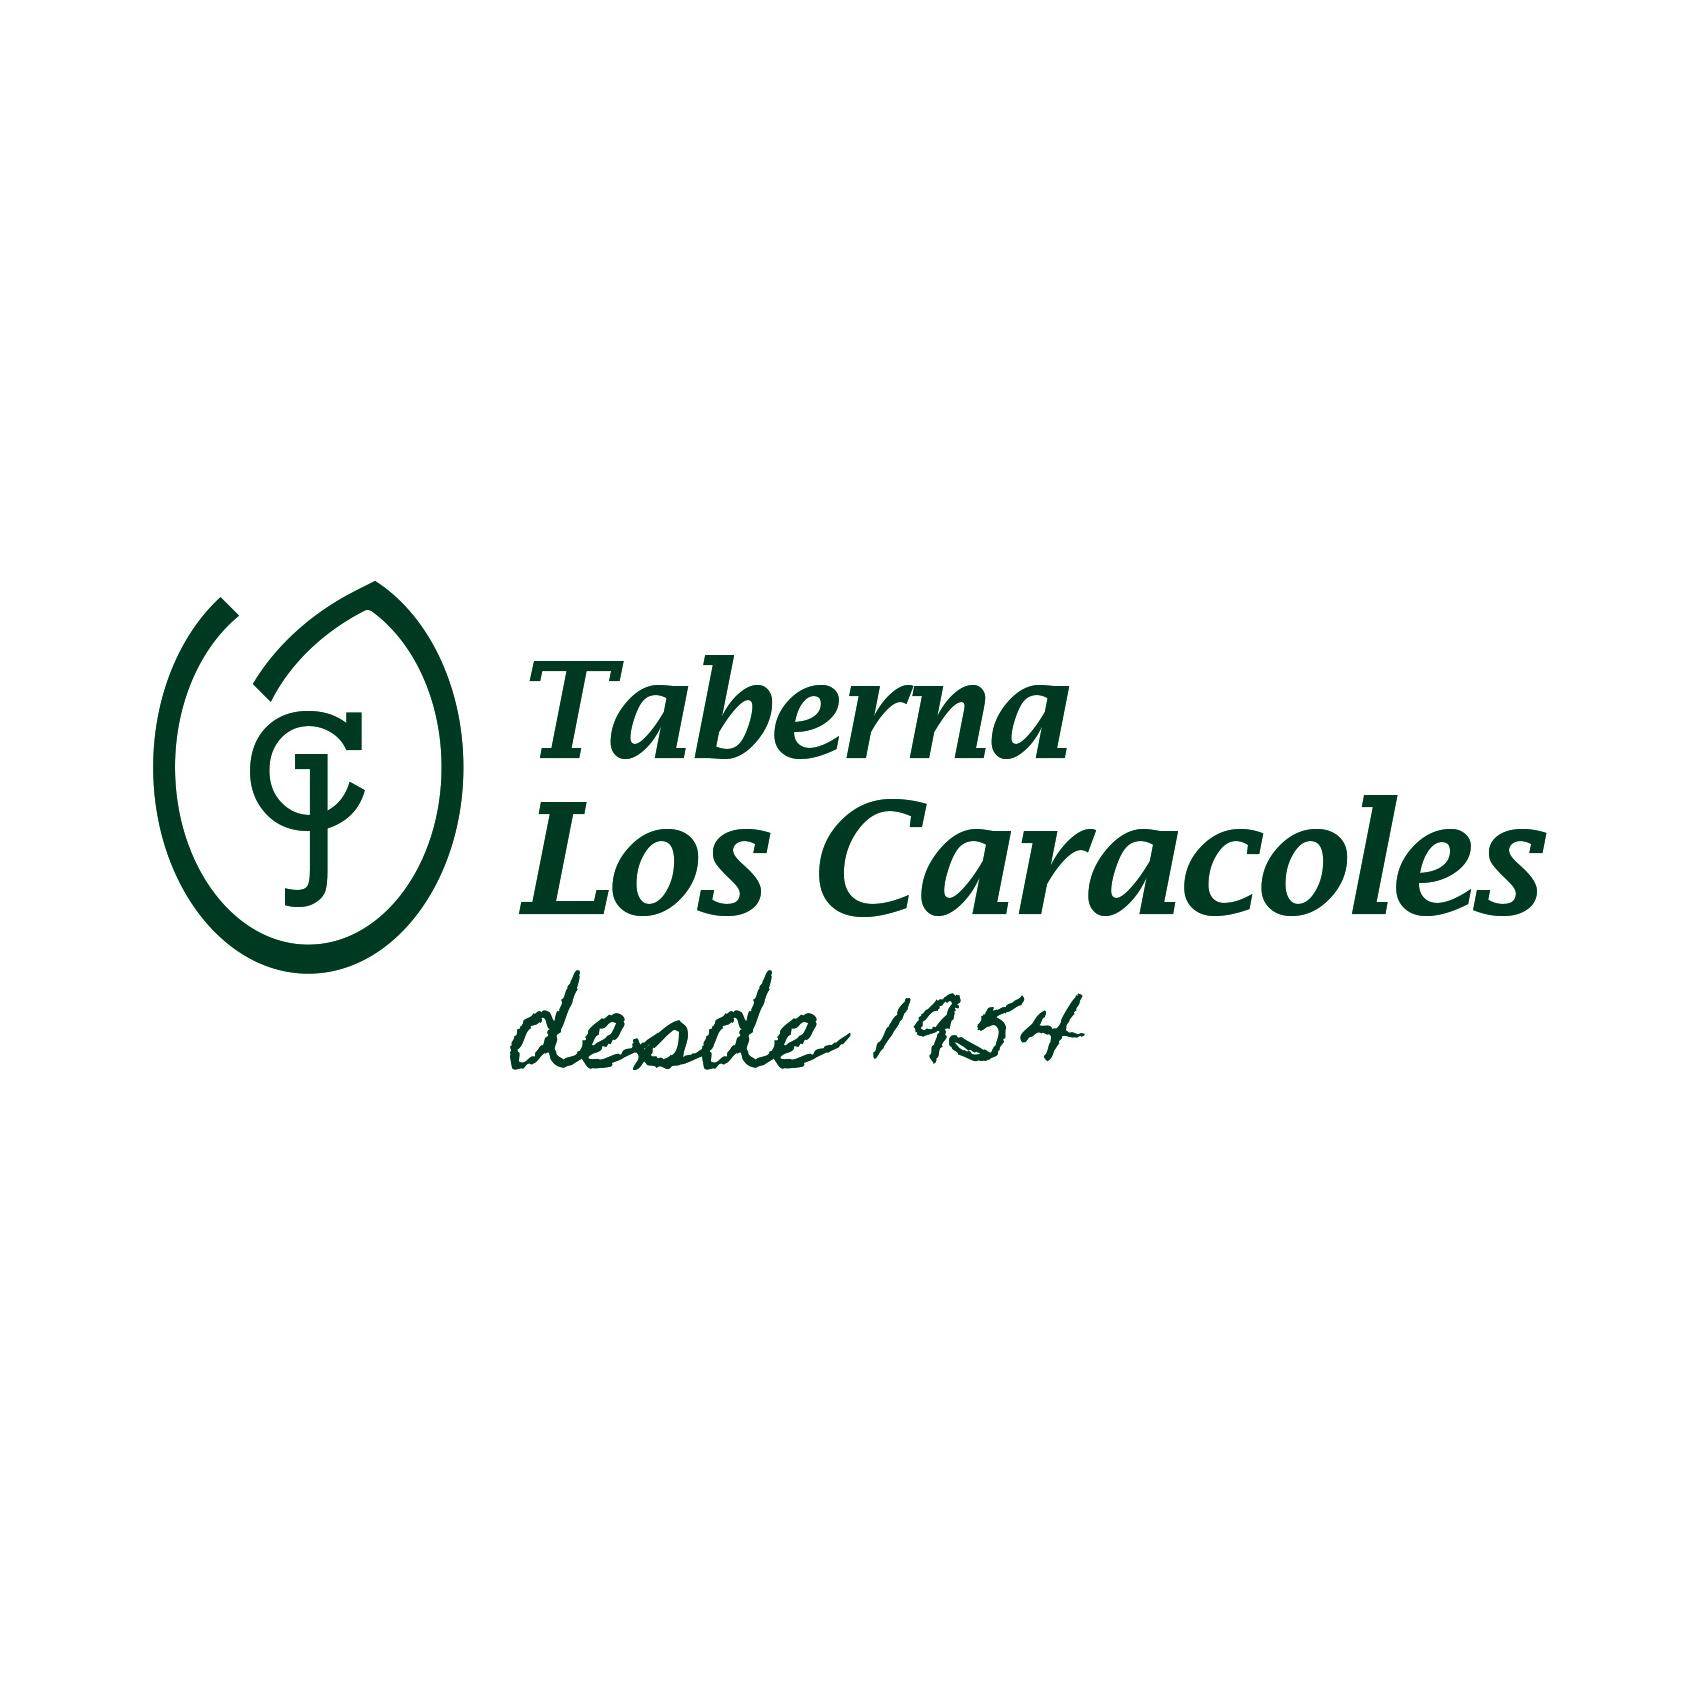 marca_branding_taberna_los_caracoles_textura_design